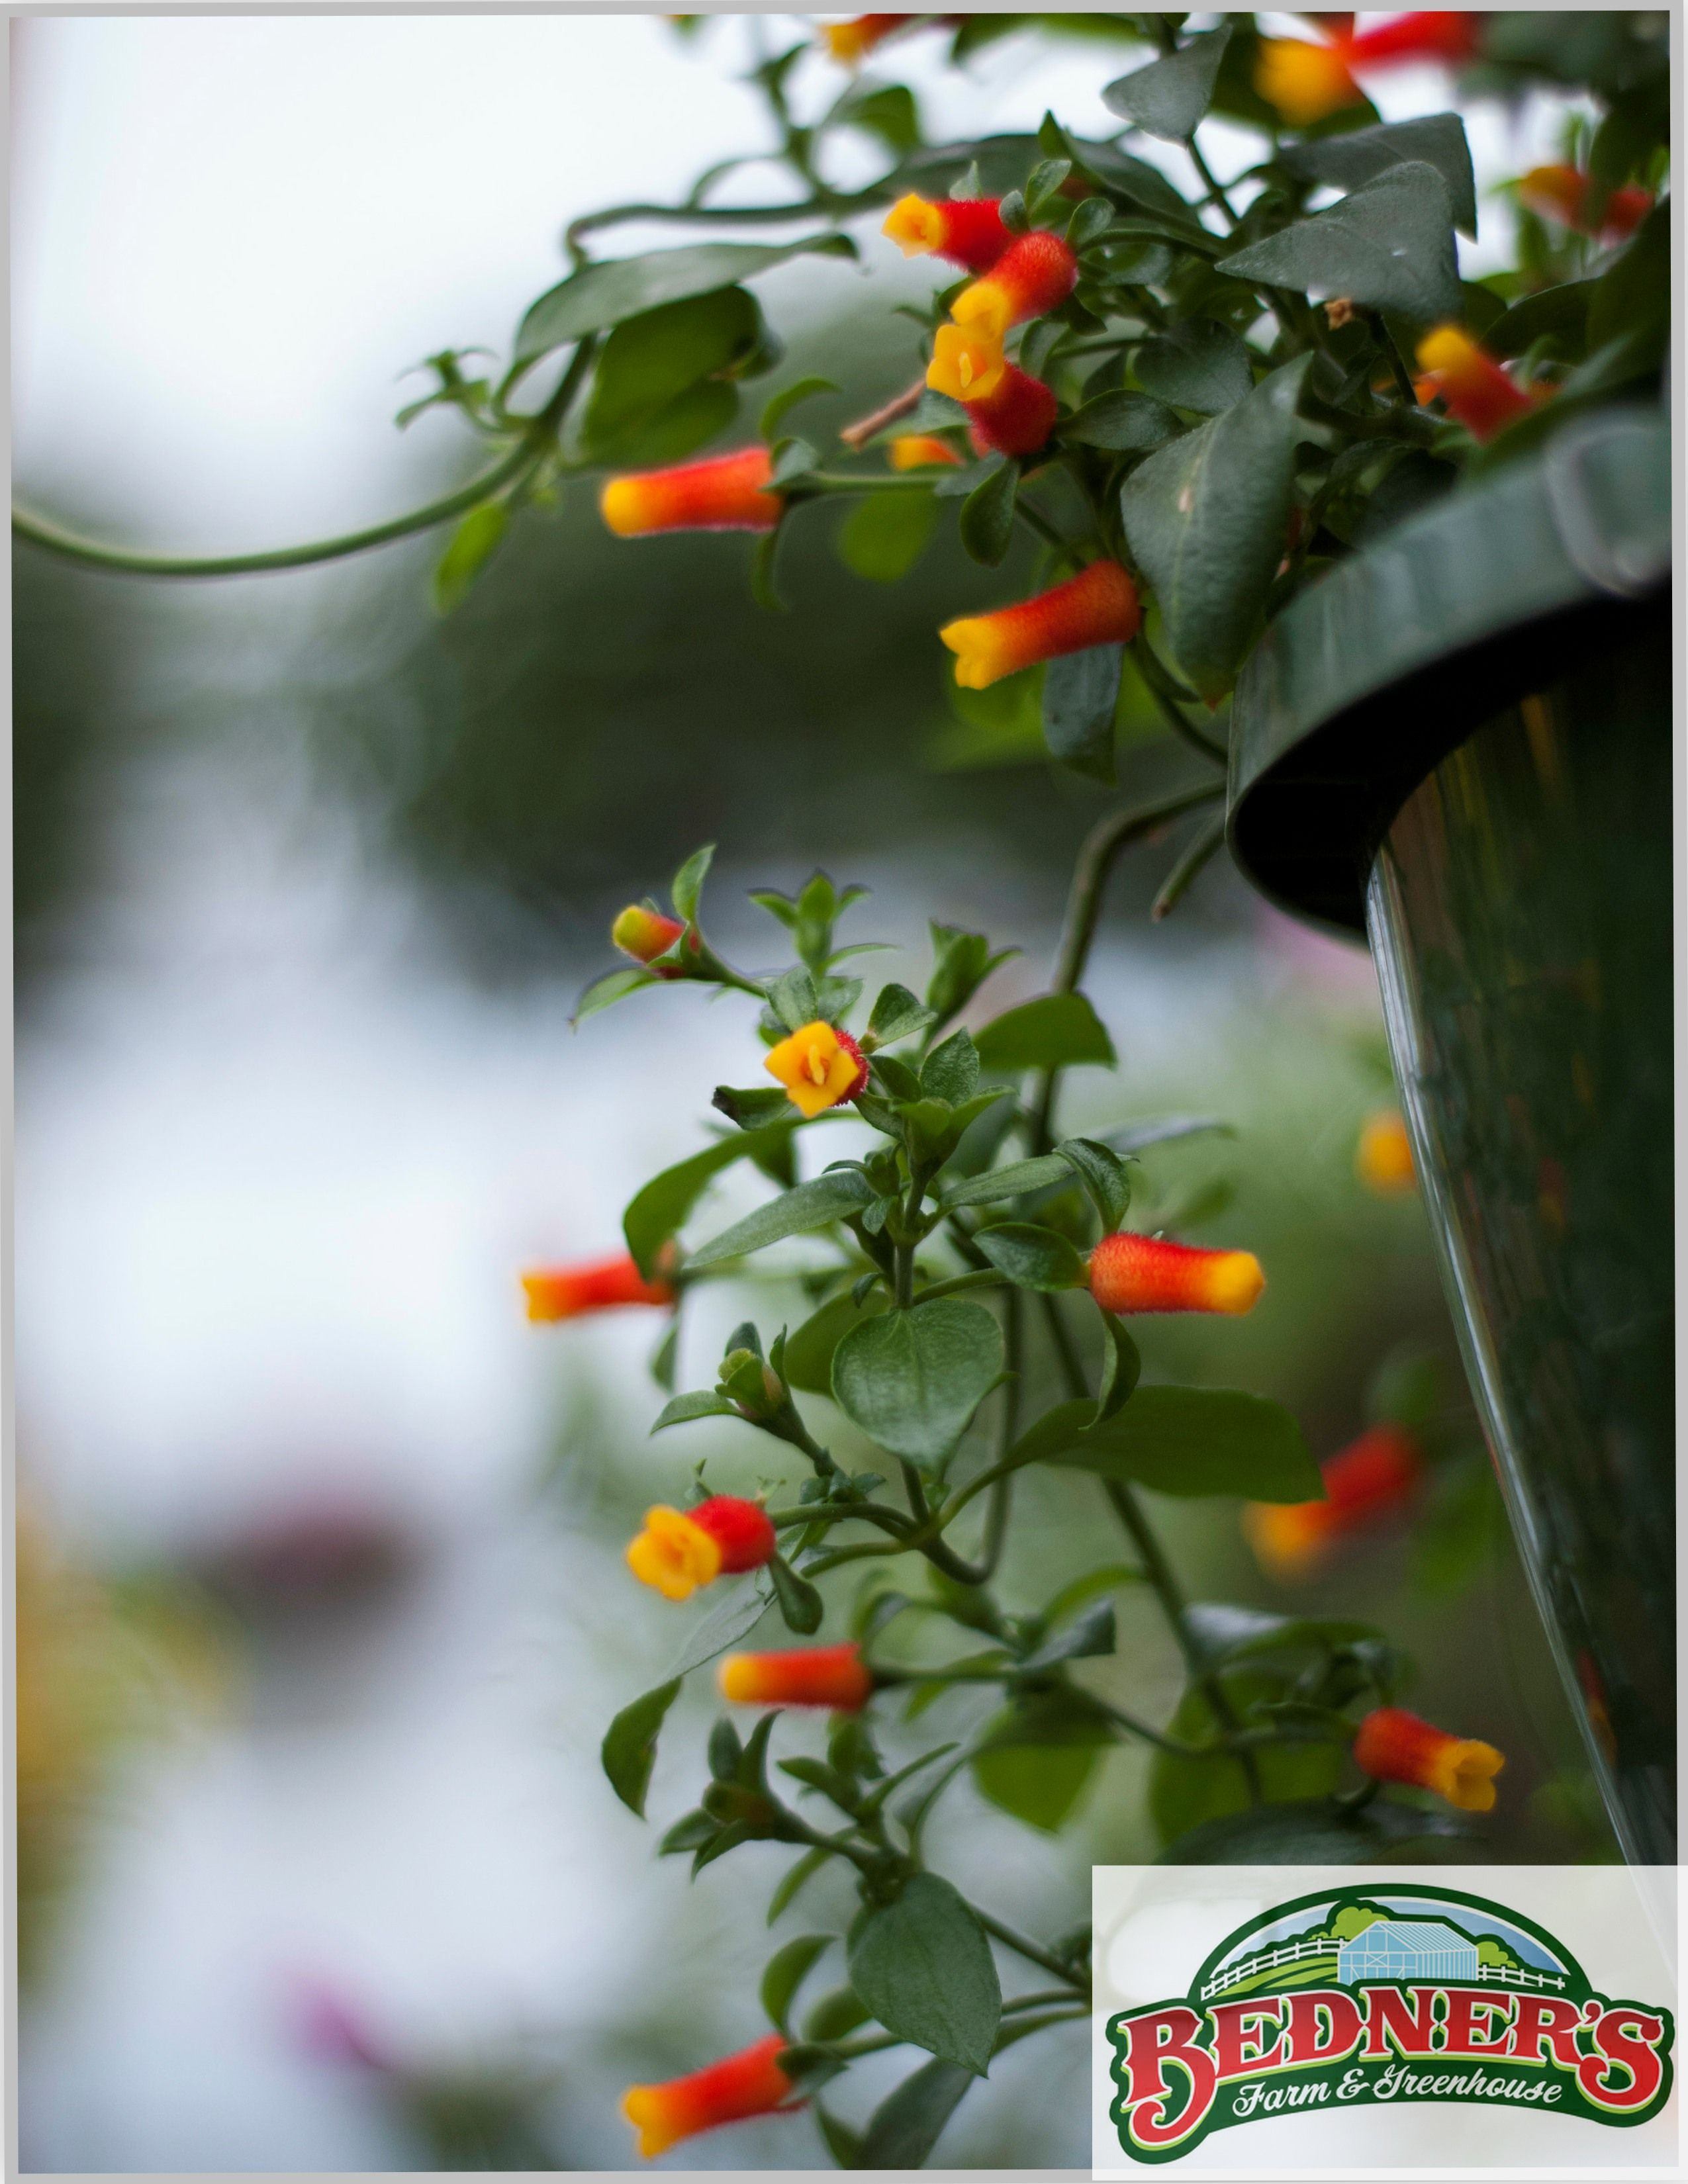 Climbing Vine Trellis Ideas Part - 48: Candy Corn Vine (Manettia) - A Climbing Vine For Hanging Baskets And  Trellises.